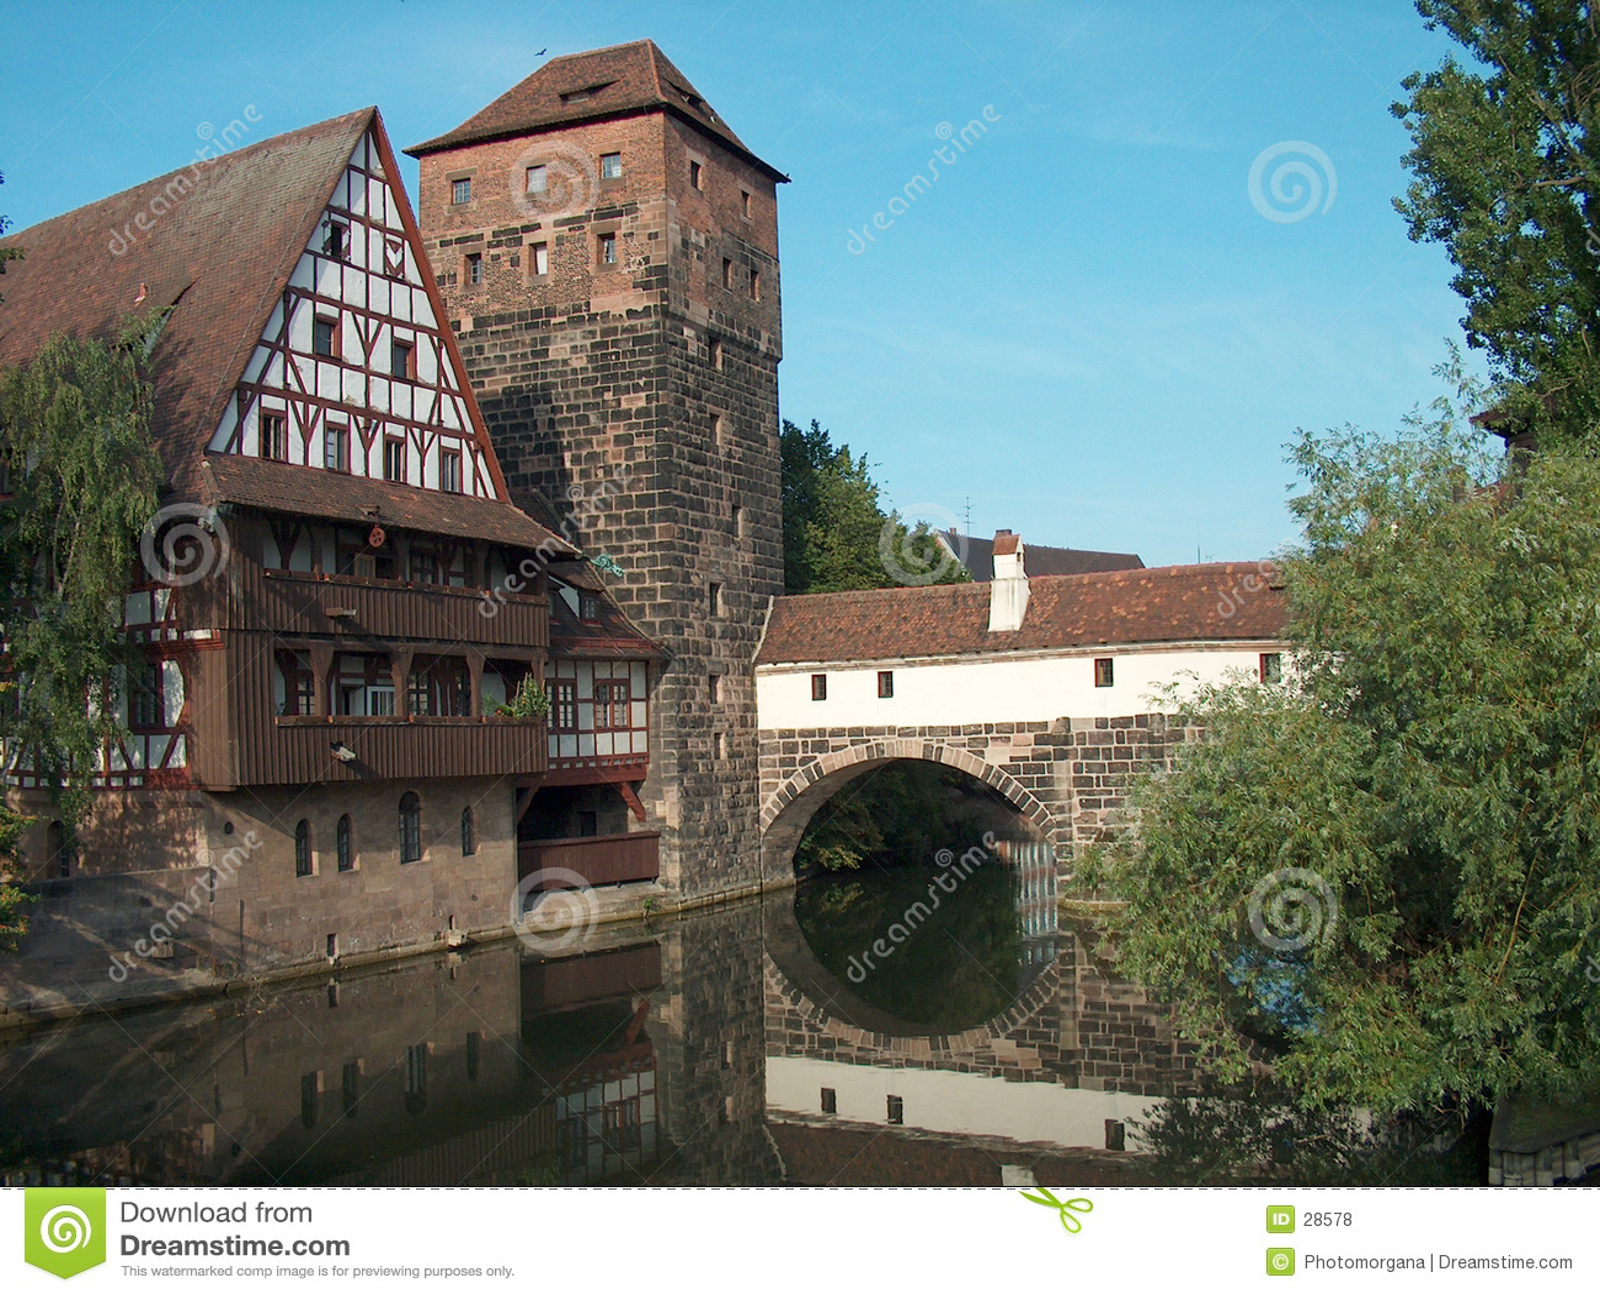 Germany nuernberg